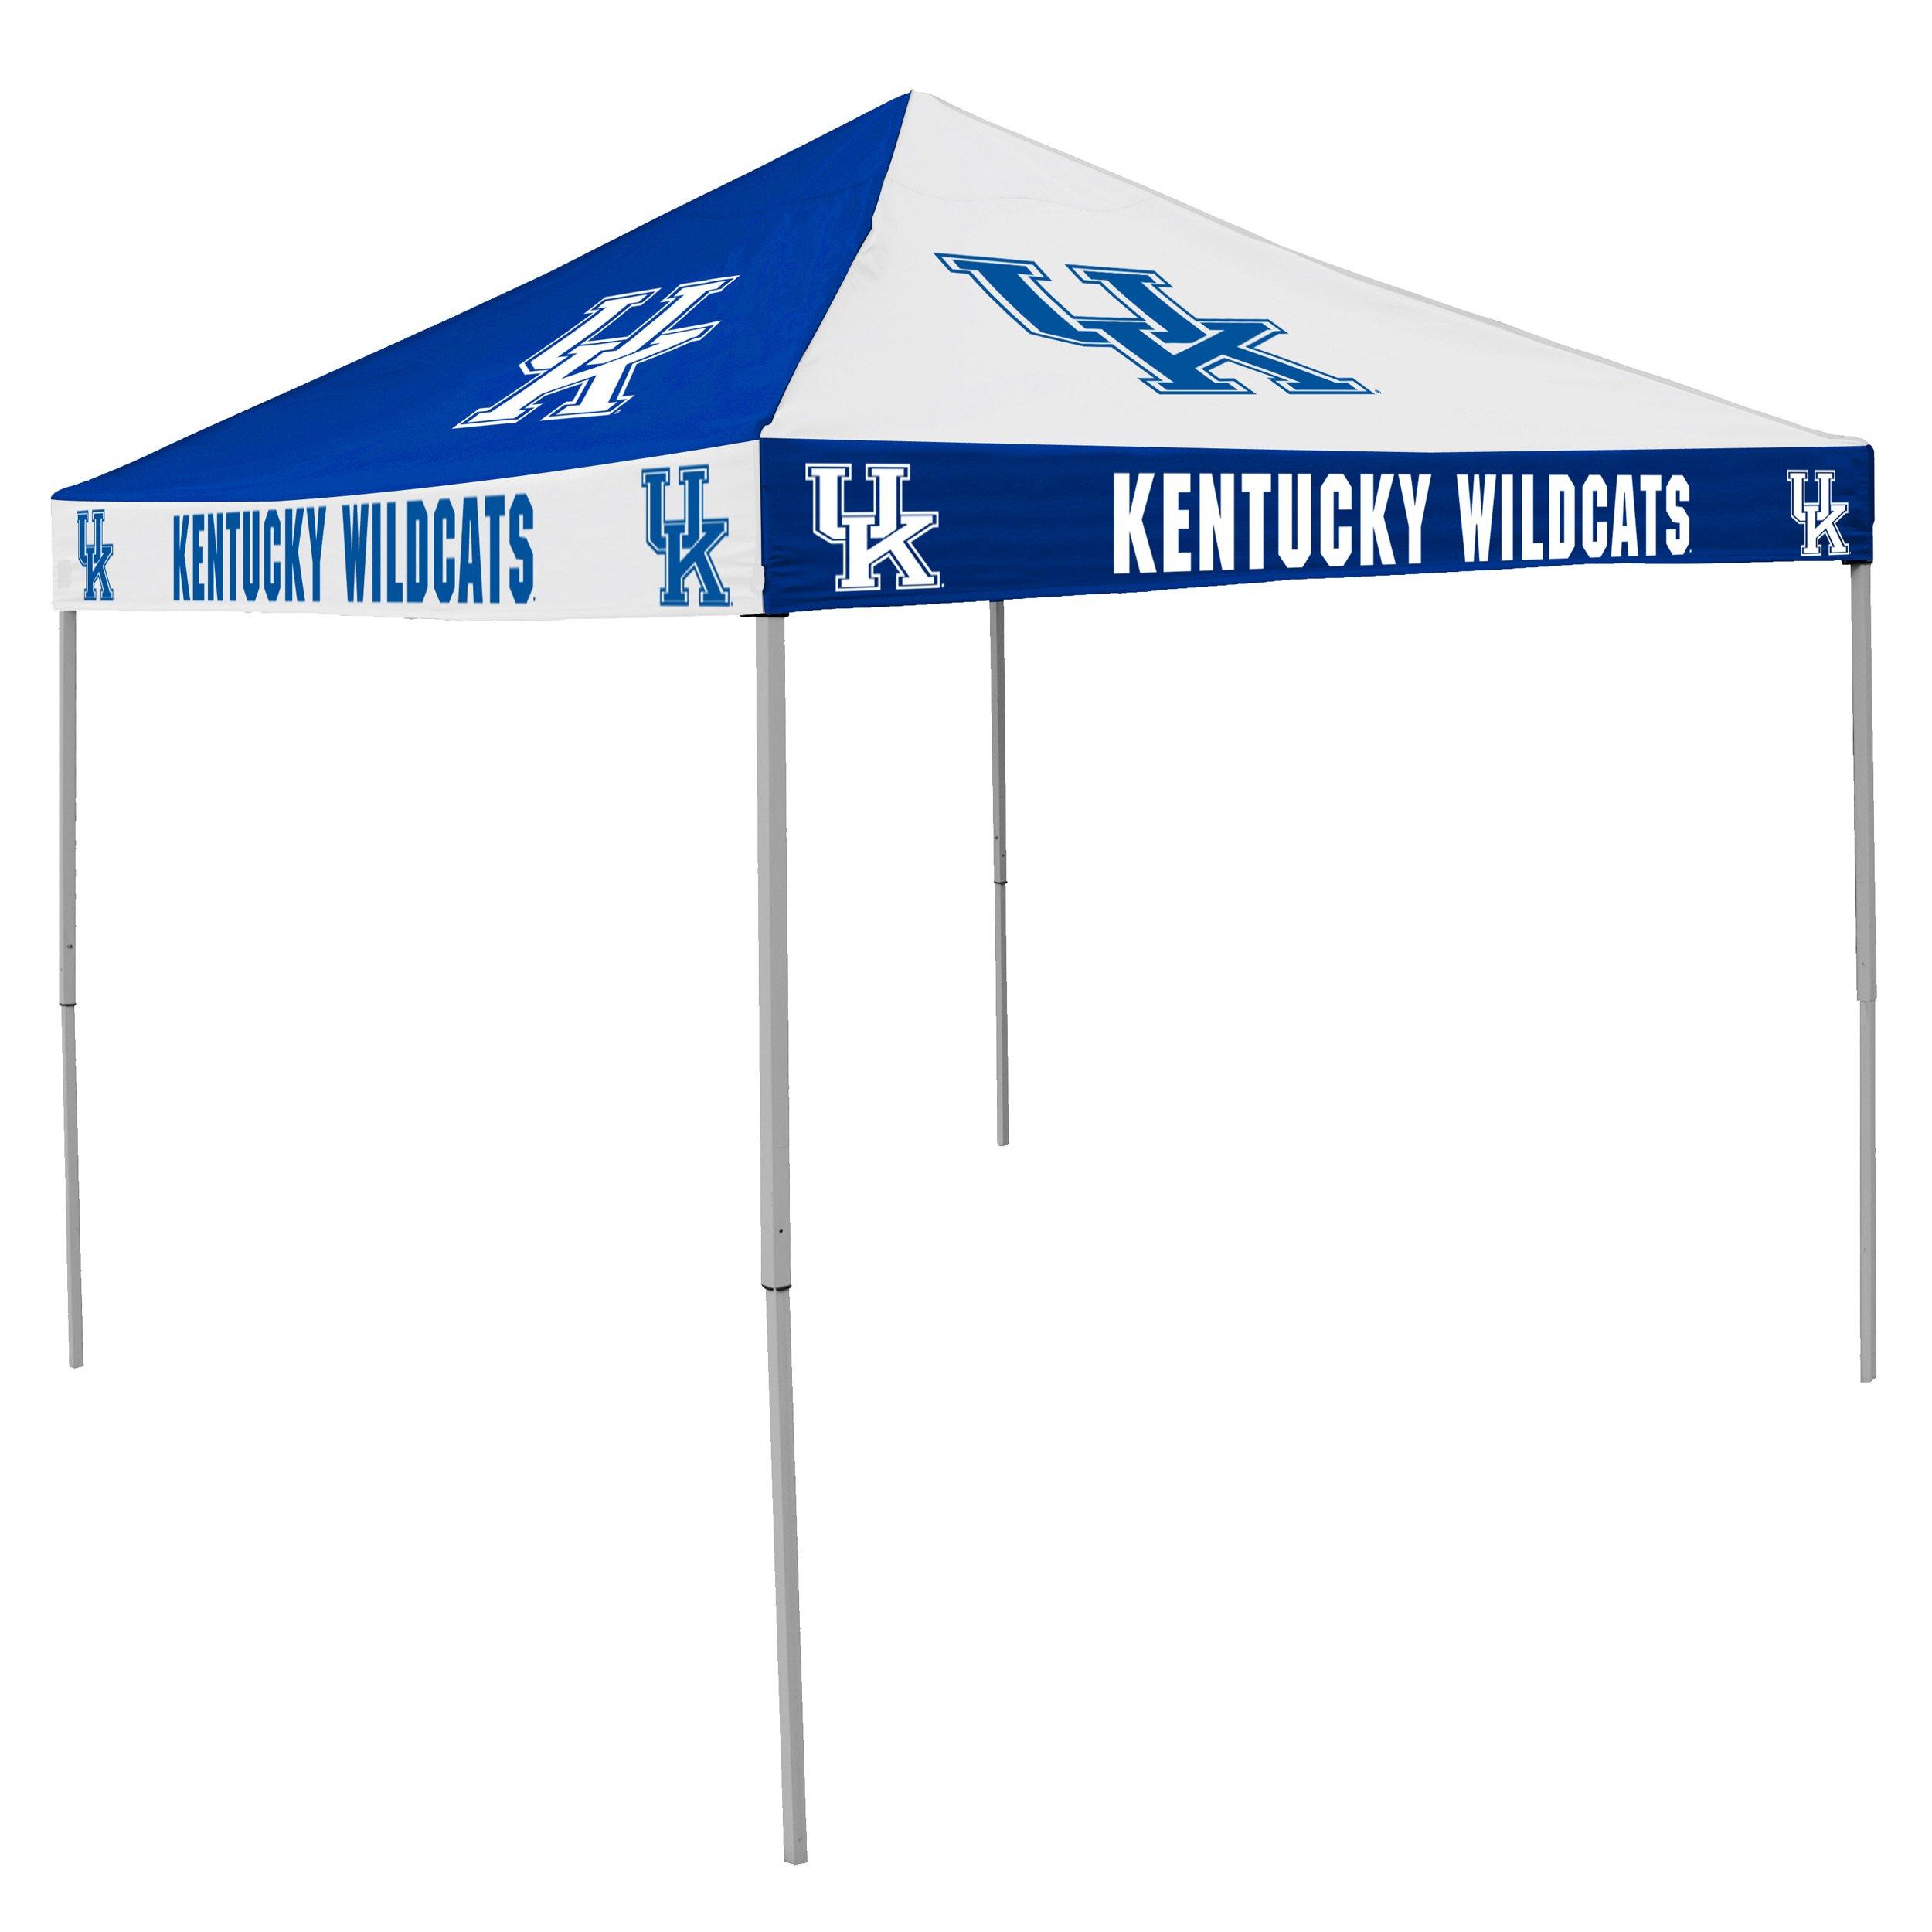 NCAA Kentucky Wildcats 9-Foot x 9-Foot Pinwheel Tailgating Canopy, Blue/White